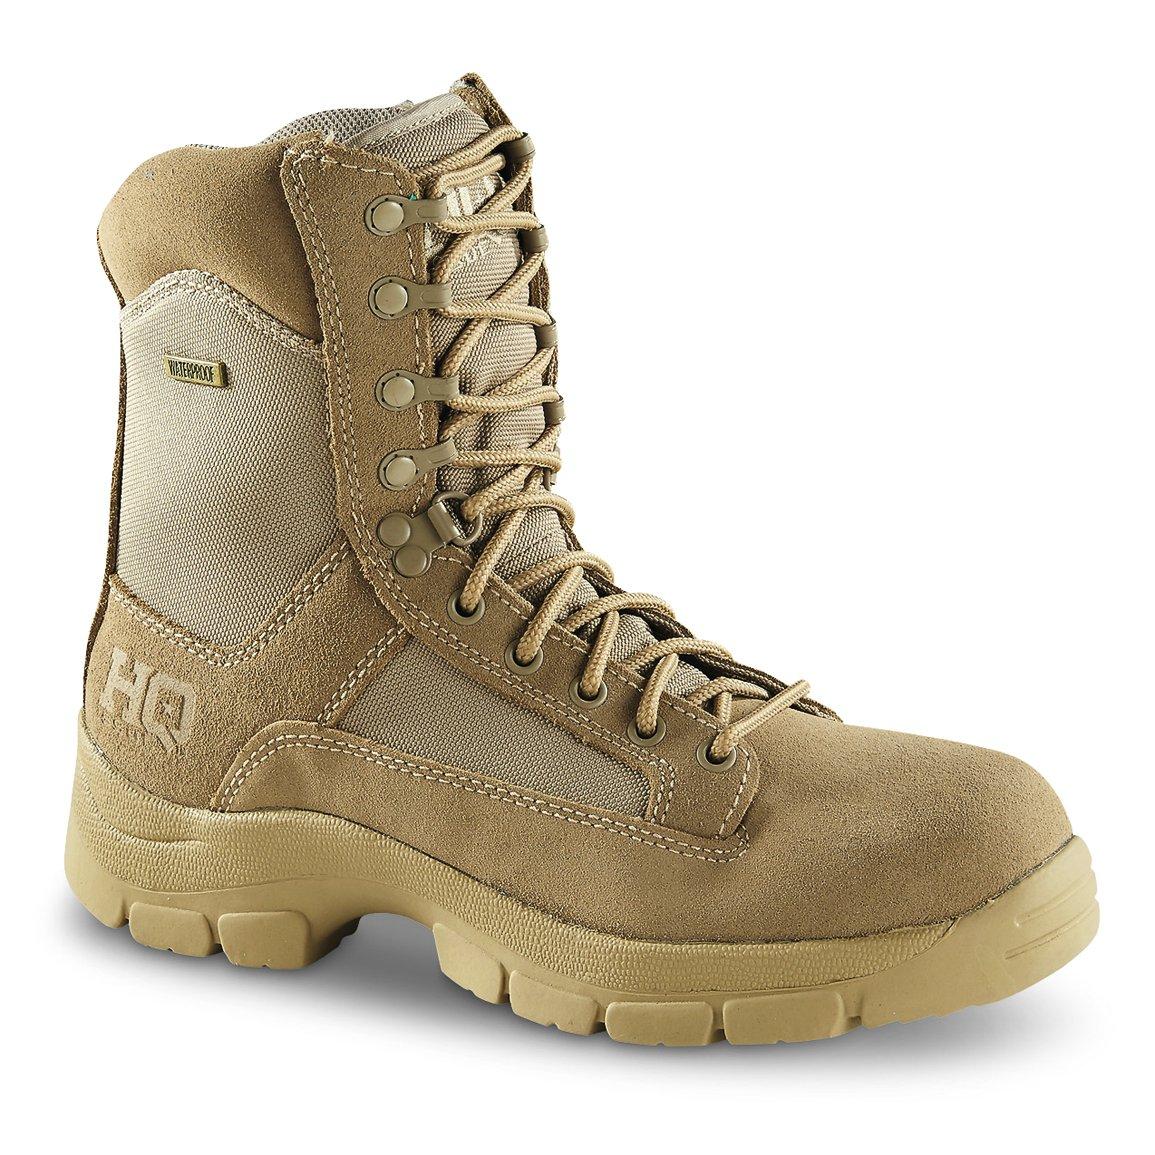 HQ ISSUE Men's Waterproof 8'' Side Zip Desert Boots